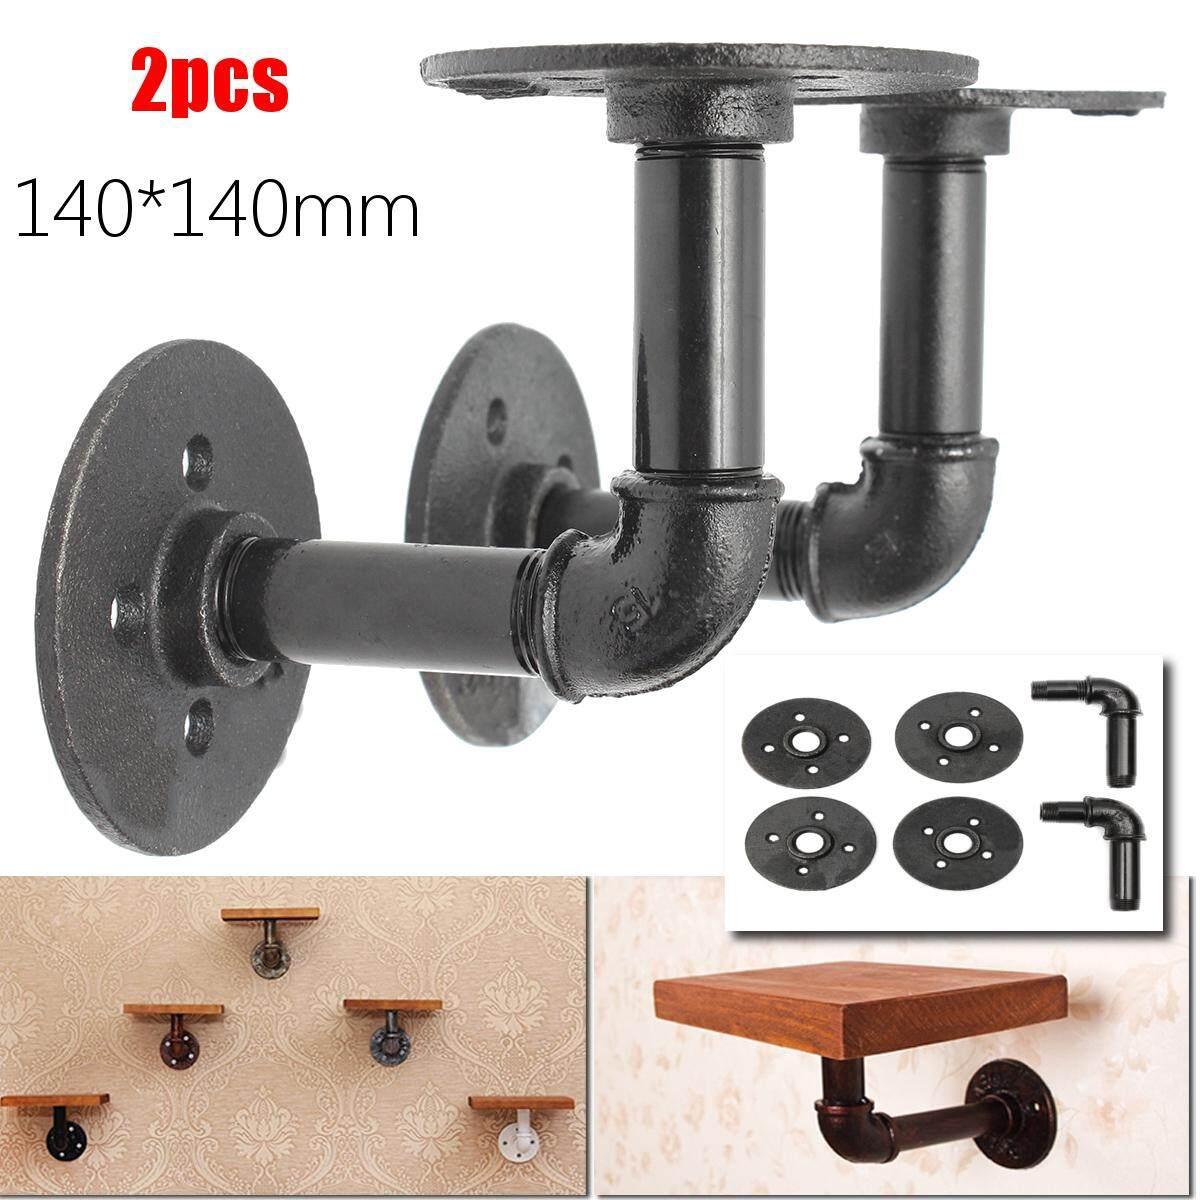 2pcs Steampunk Industrial Iron 3/4 Pipe Shelf Bracket Holder Retro Styles